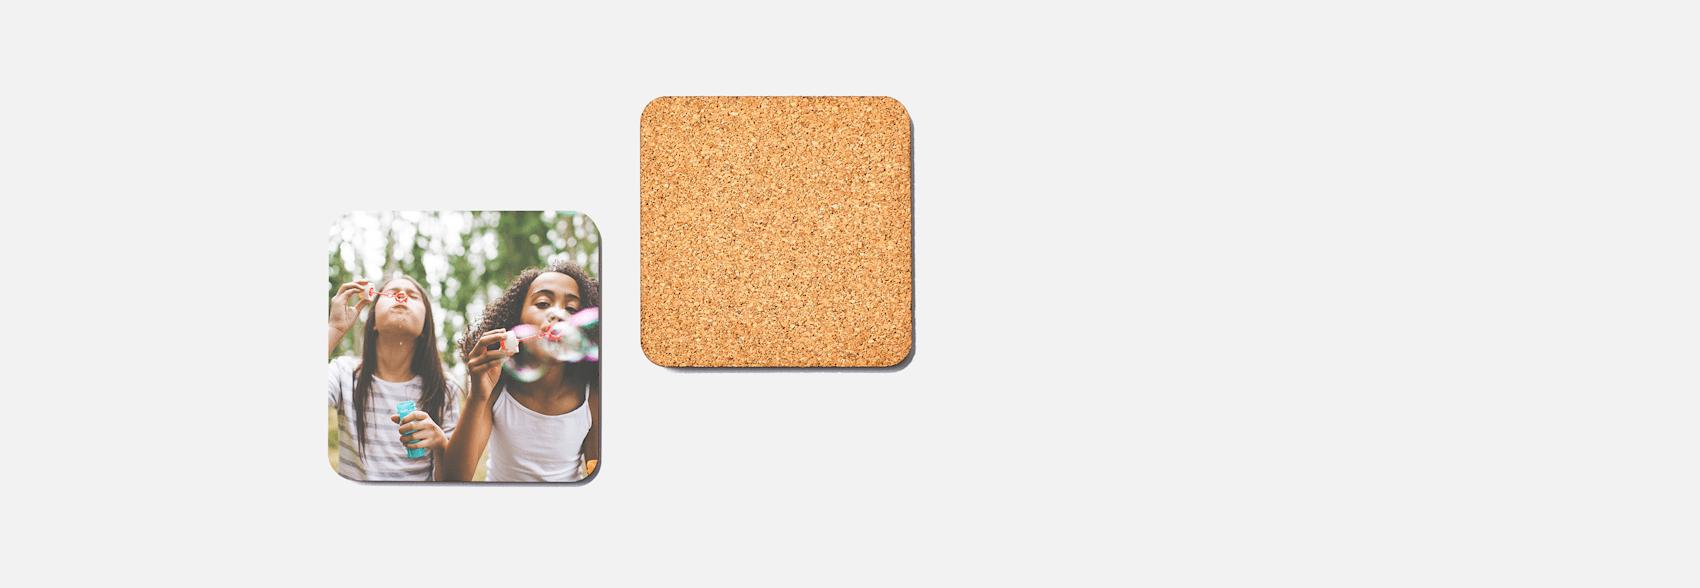 custom coasters with cork back